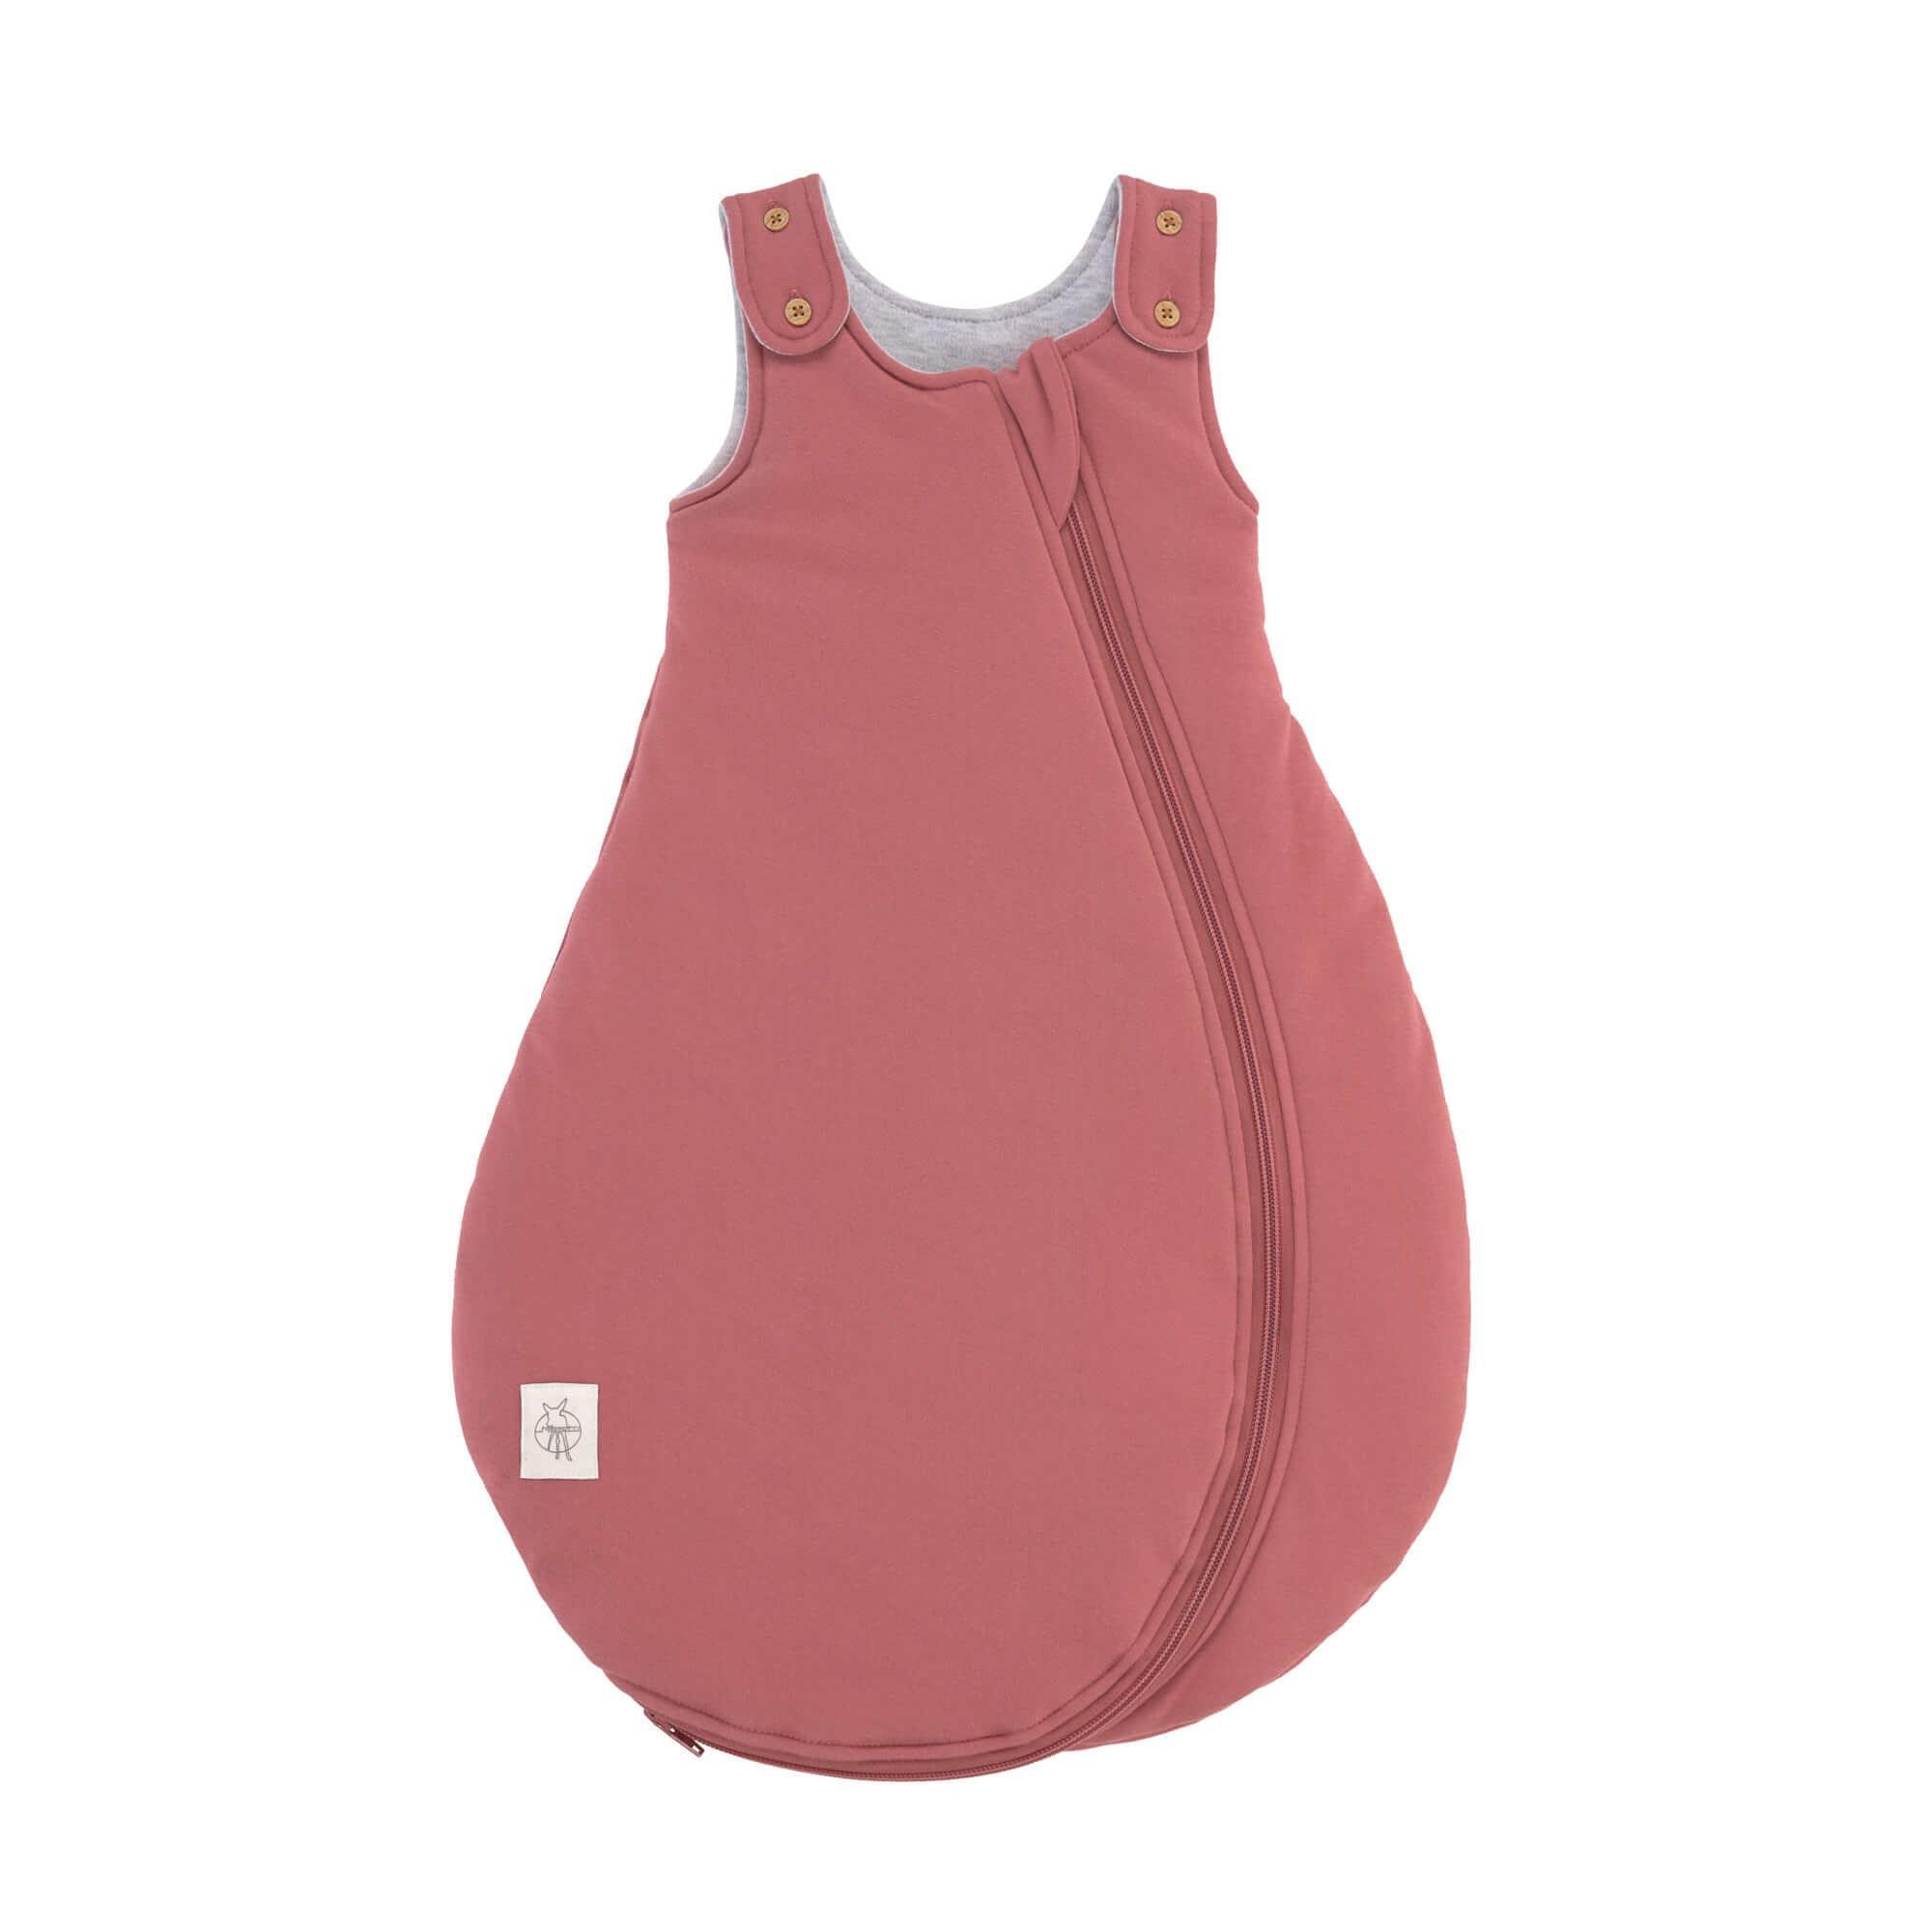 Lassig - Baby Sleeping Bag rosewood, 62/68 2-6M, all season edition